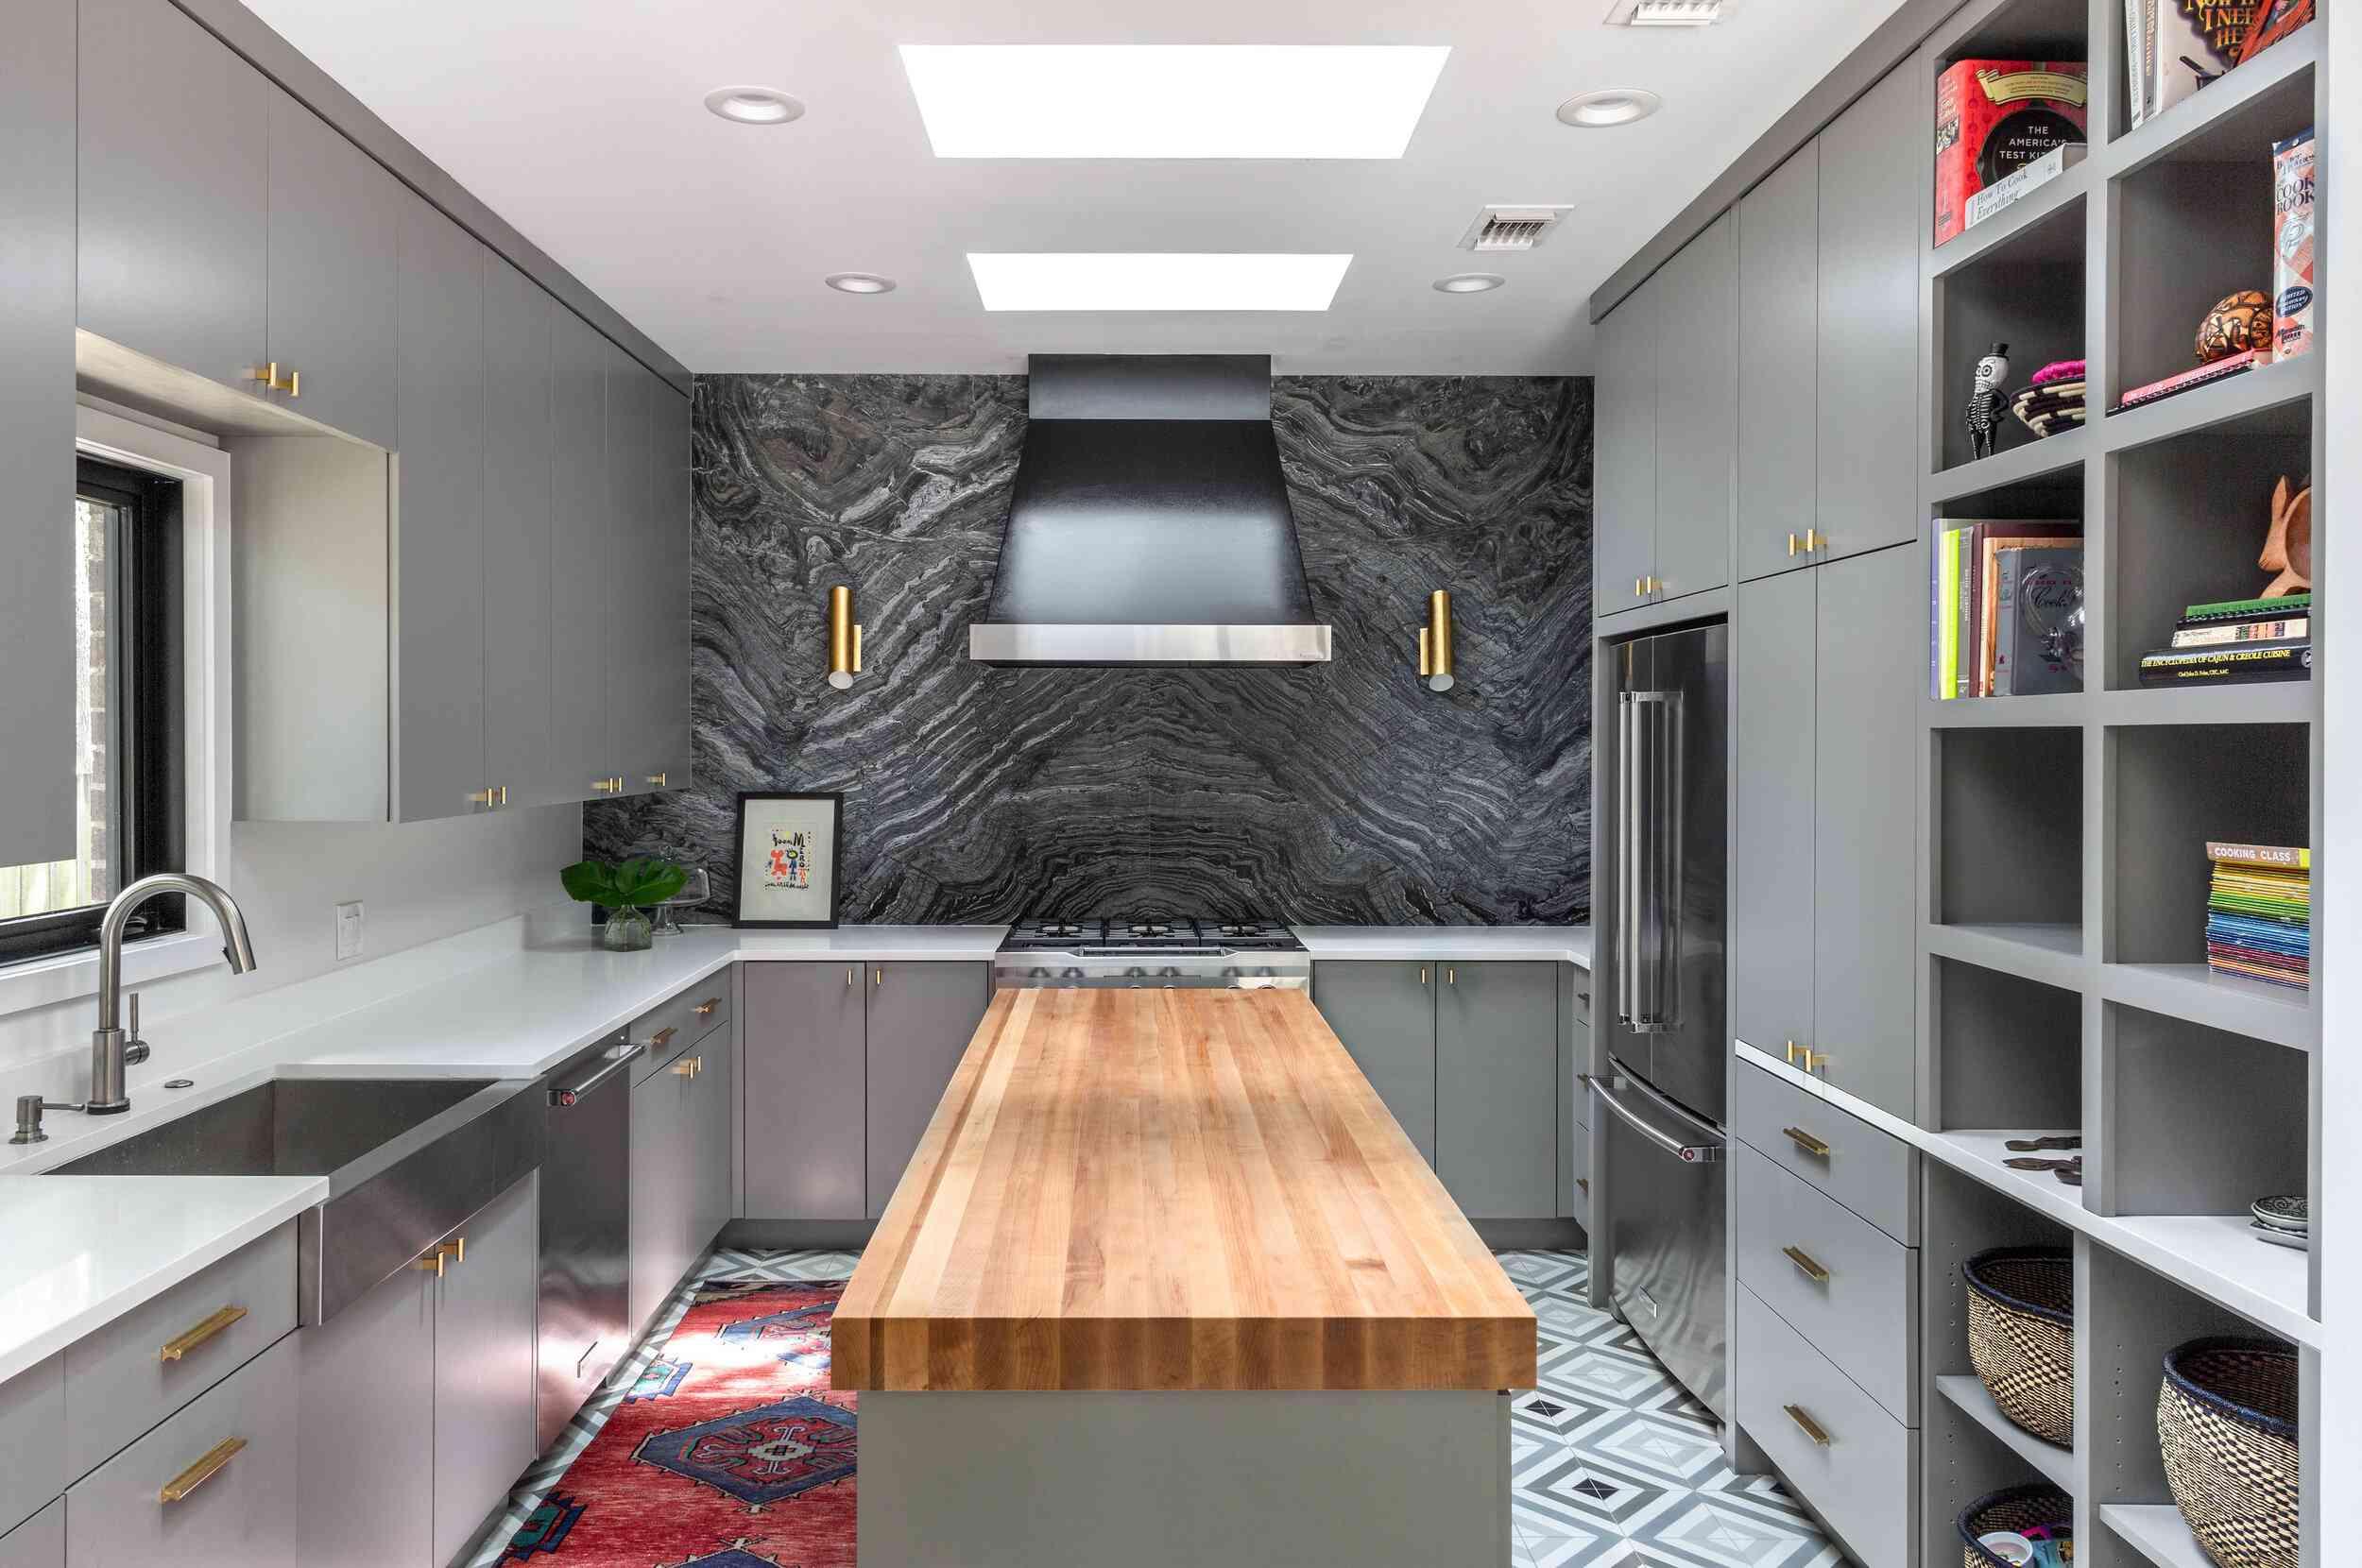 best kitchen ideas - butcher block tabletop